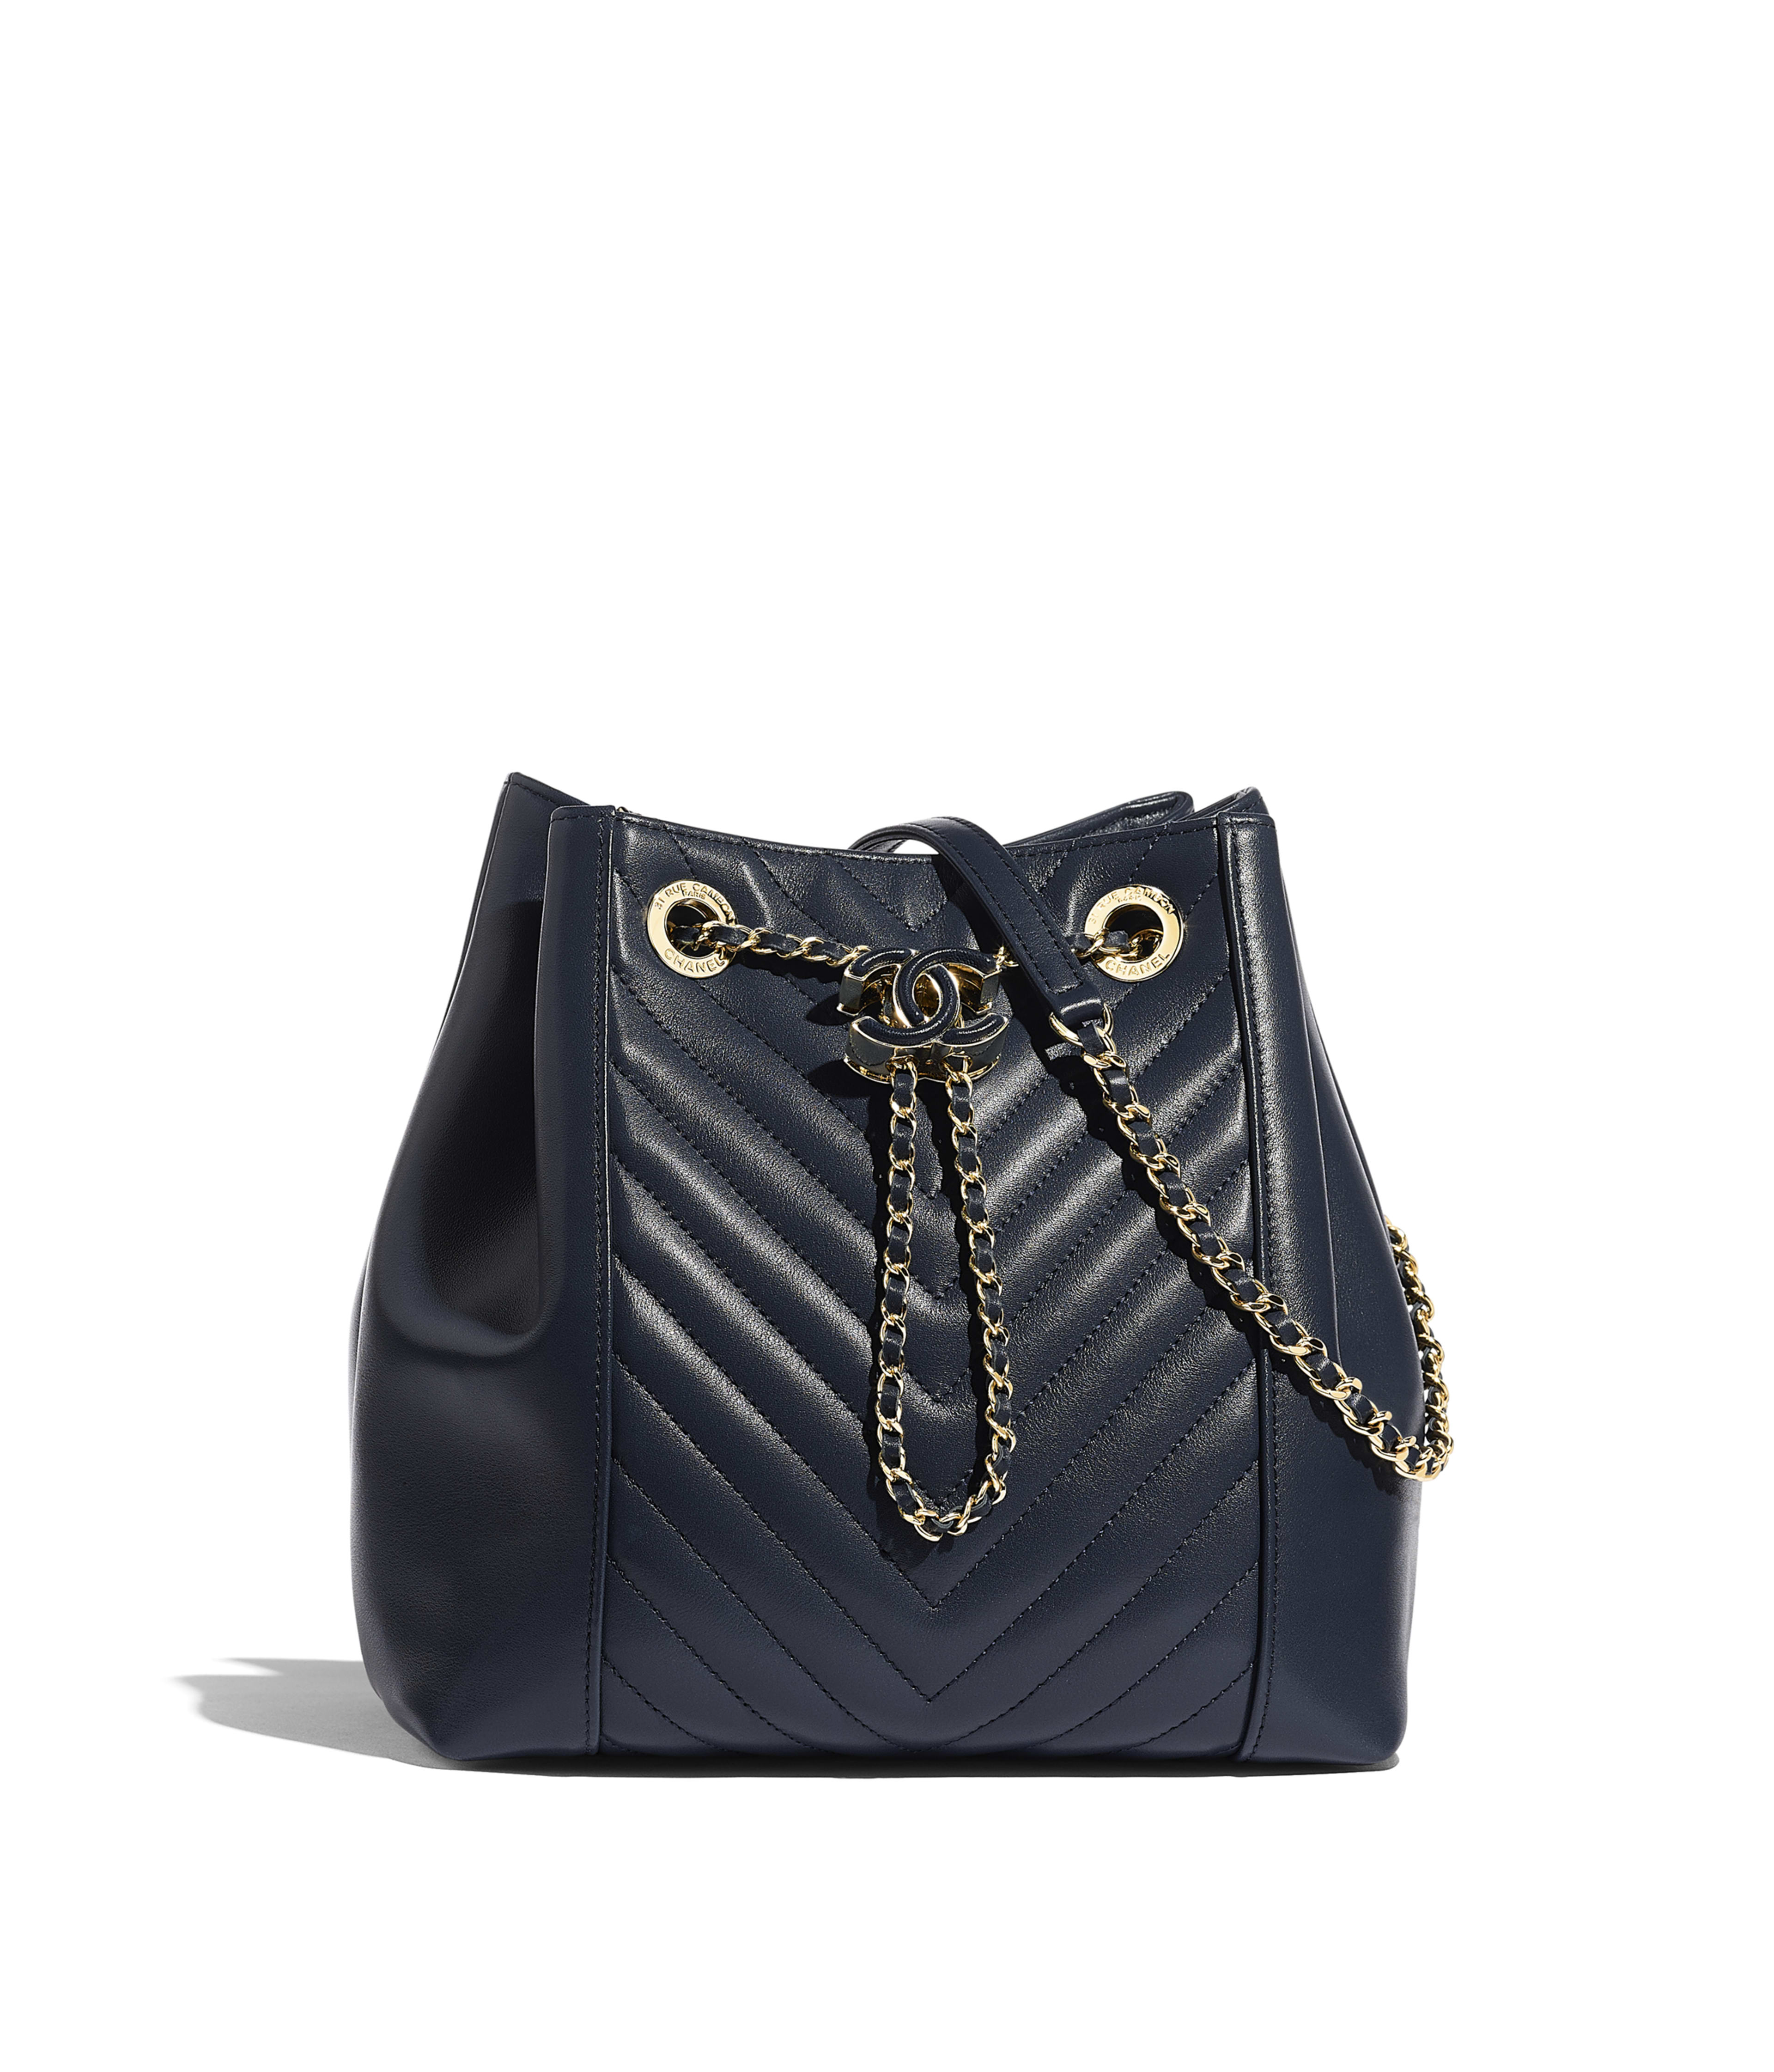 7745b53c7a0a Drawstring Bag Calfskin & Gold-Tone Metal, Navy Blue Ref. AS0263B00014N0868